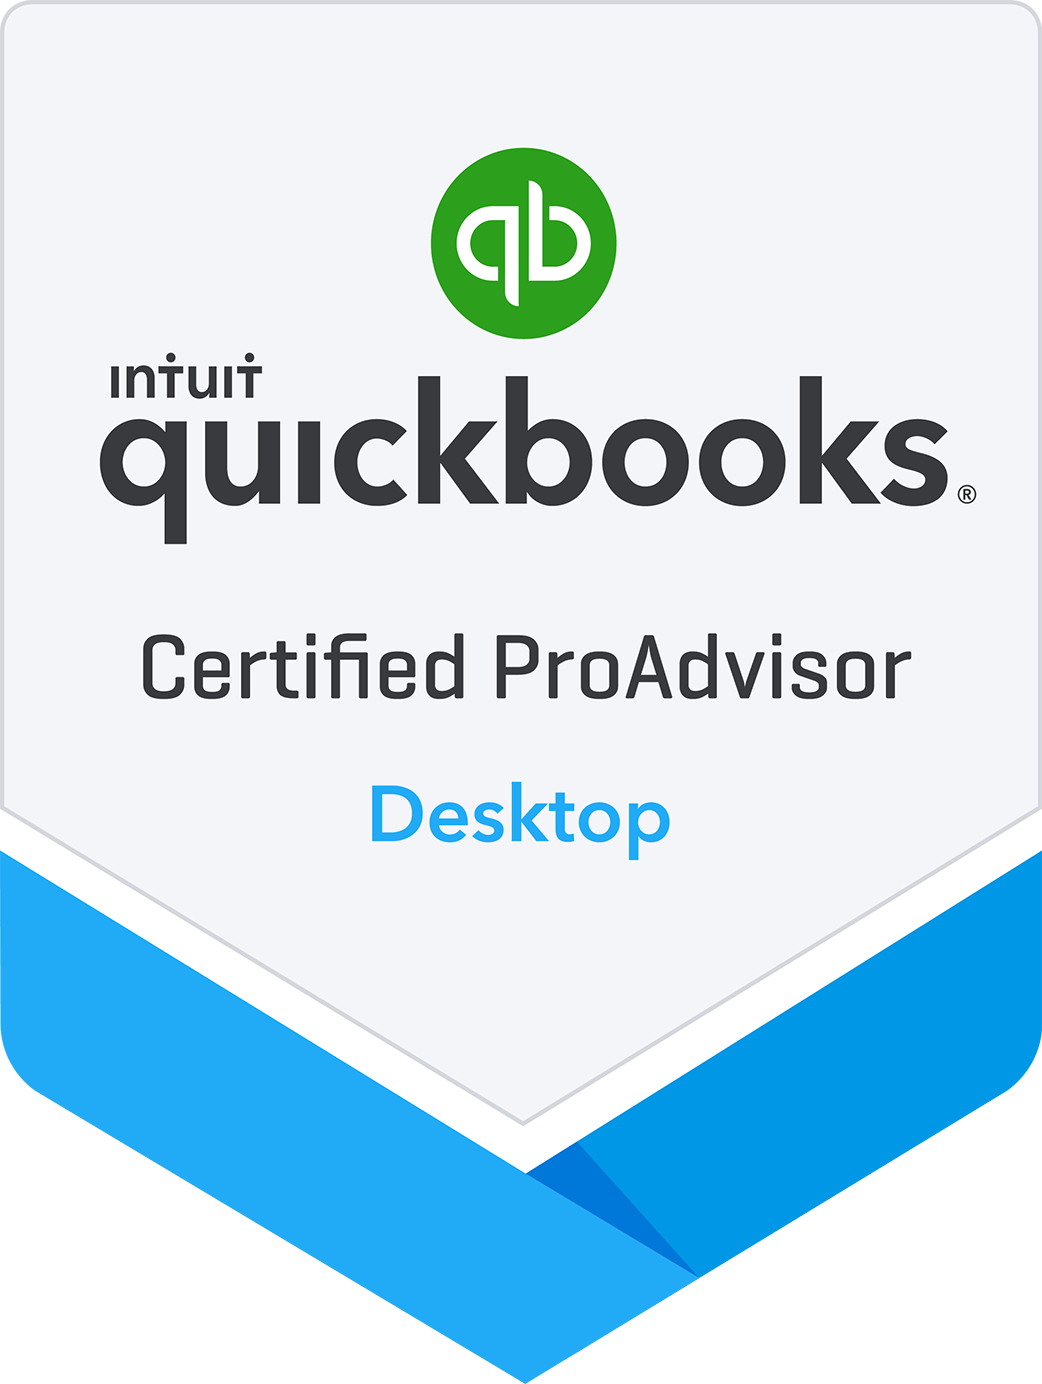 Certified QuickBooks Proadvisor Desktop Badge